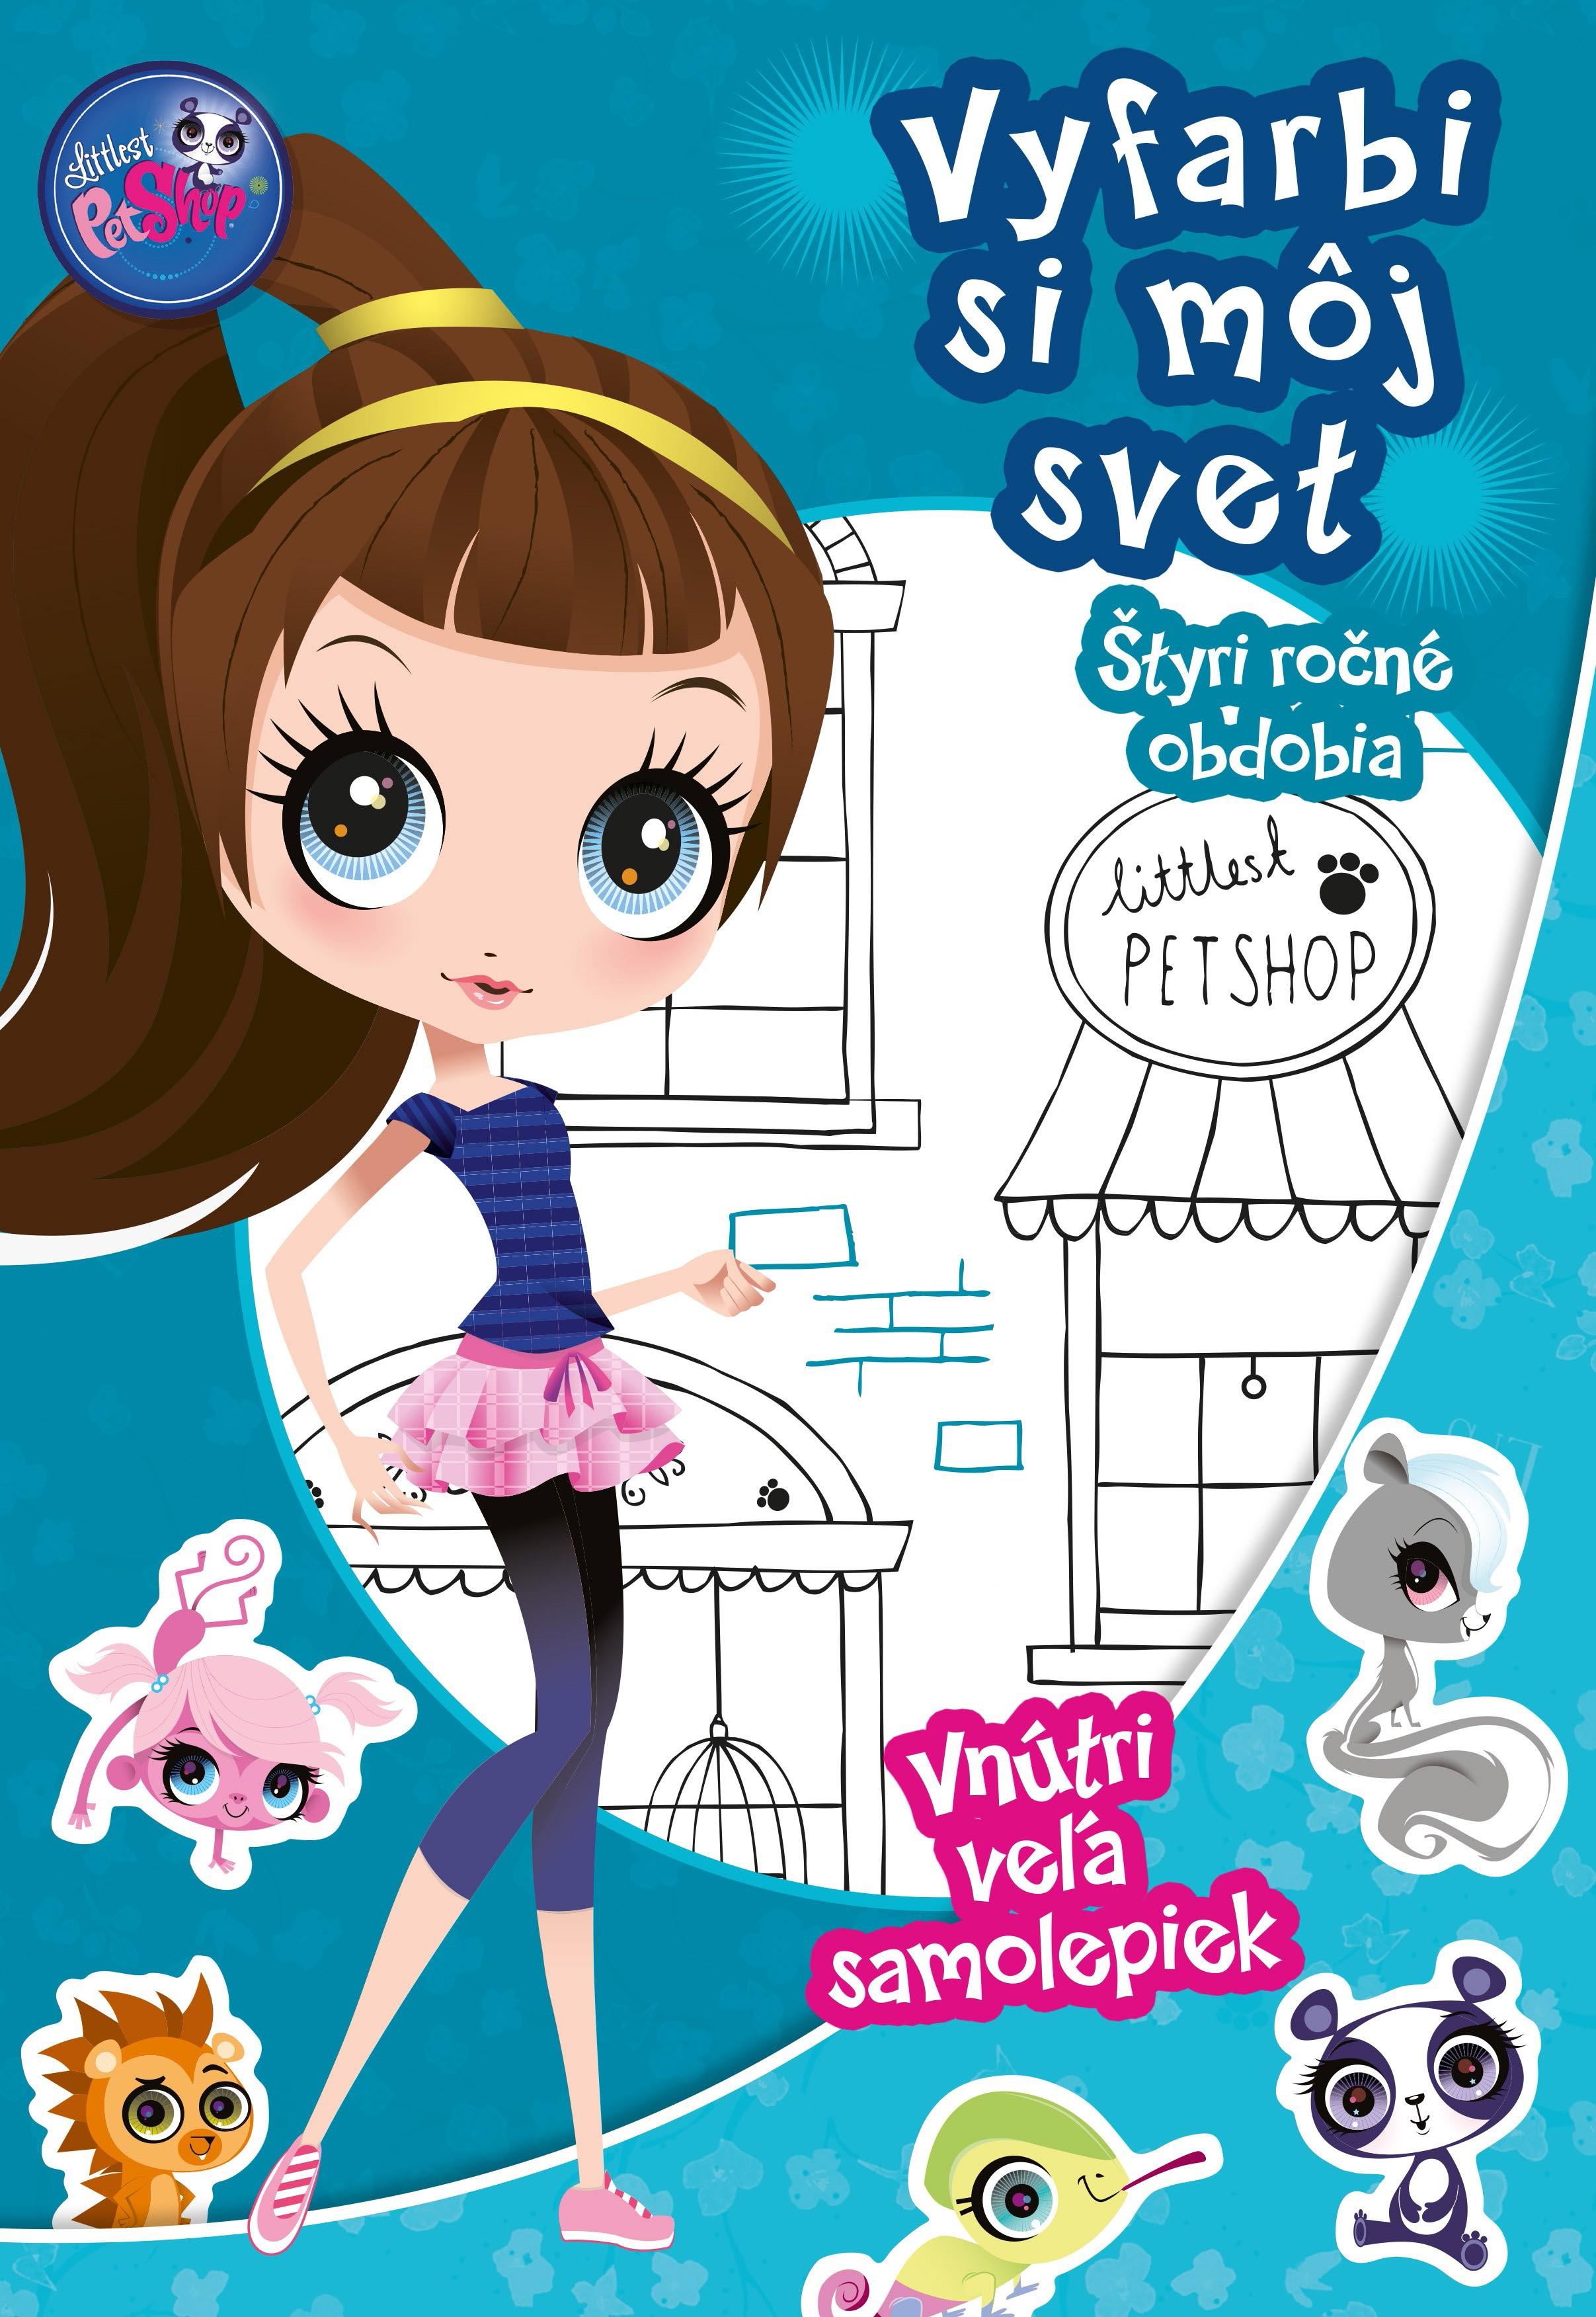 Littles Pet Shop - Vyfarbi si môj svet -Štyri ročné obdobia